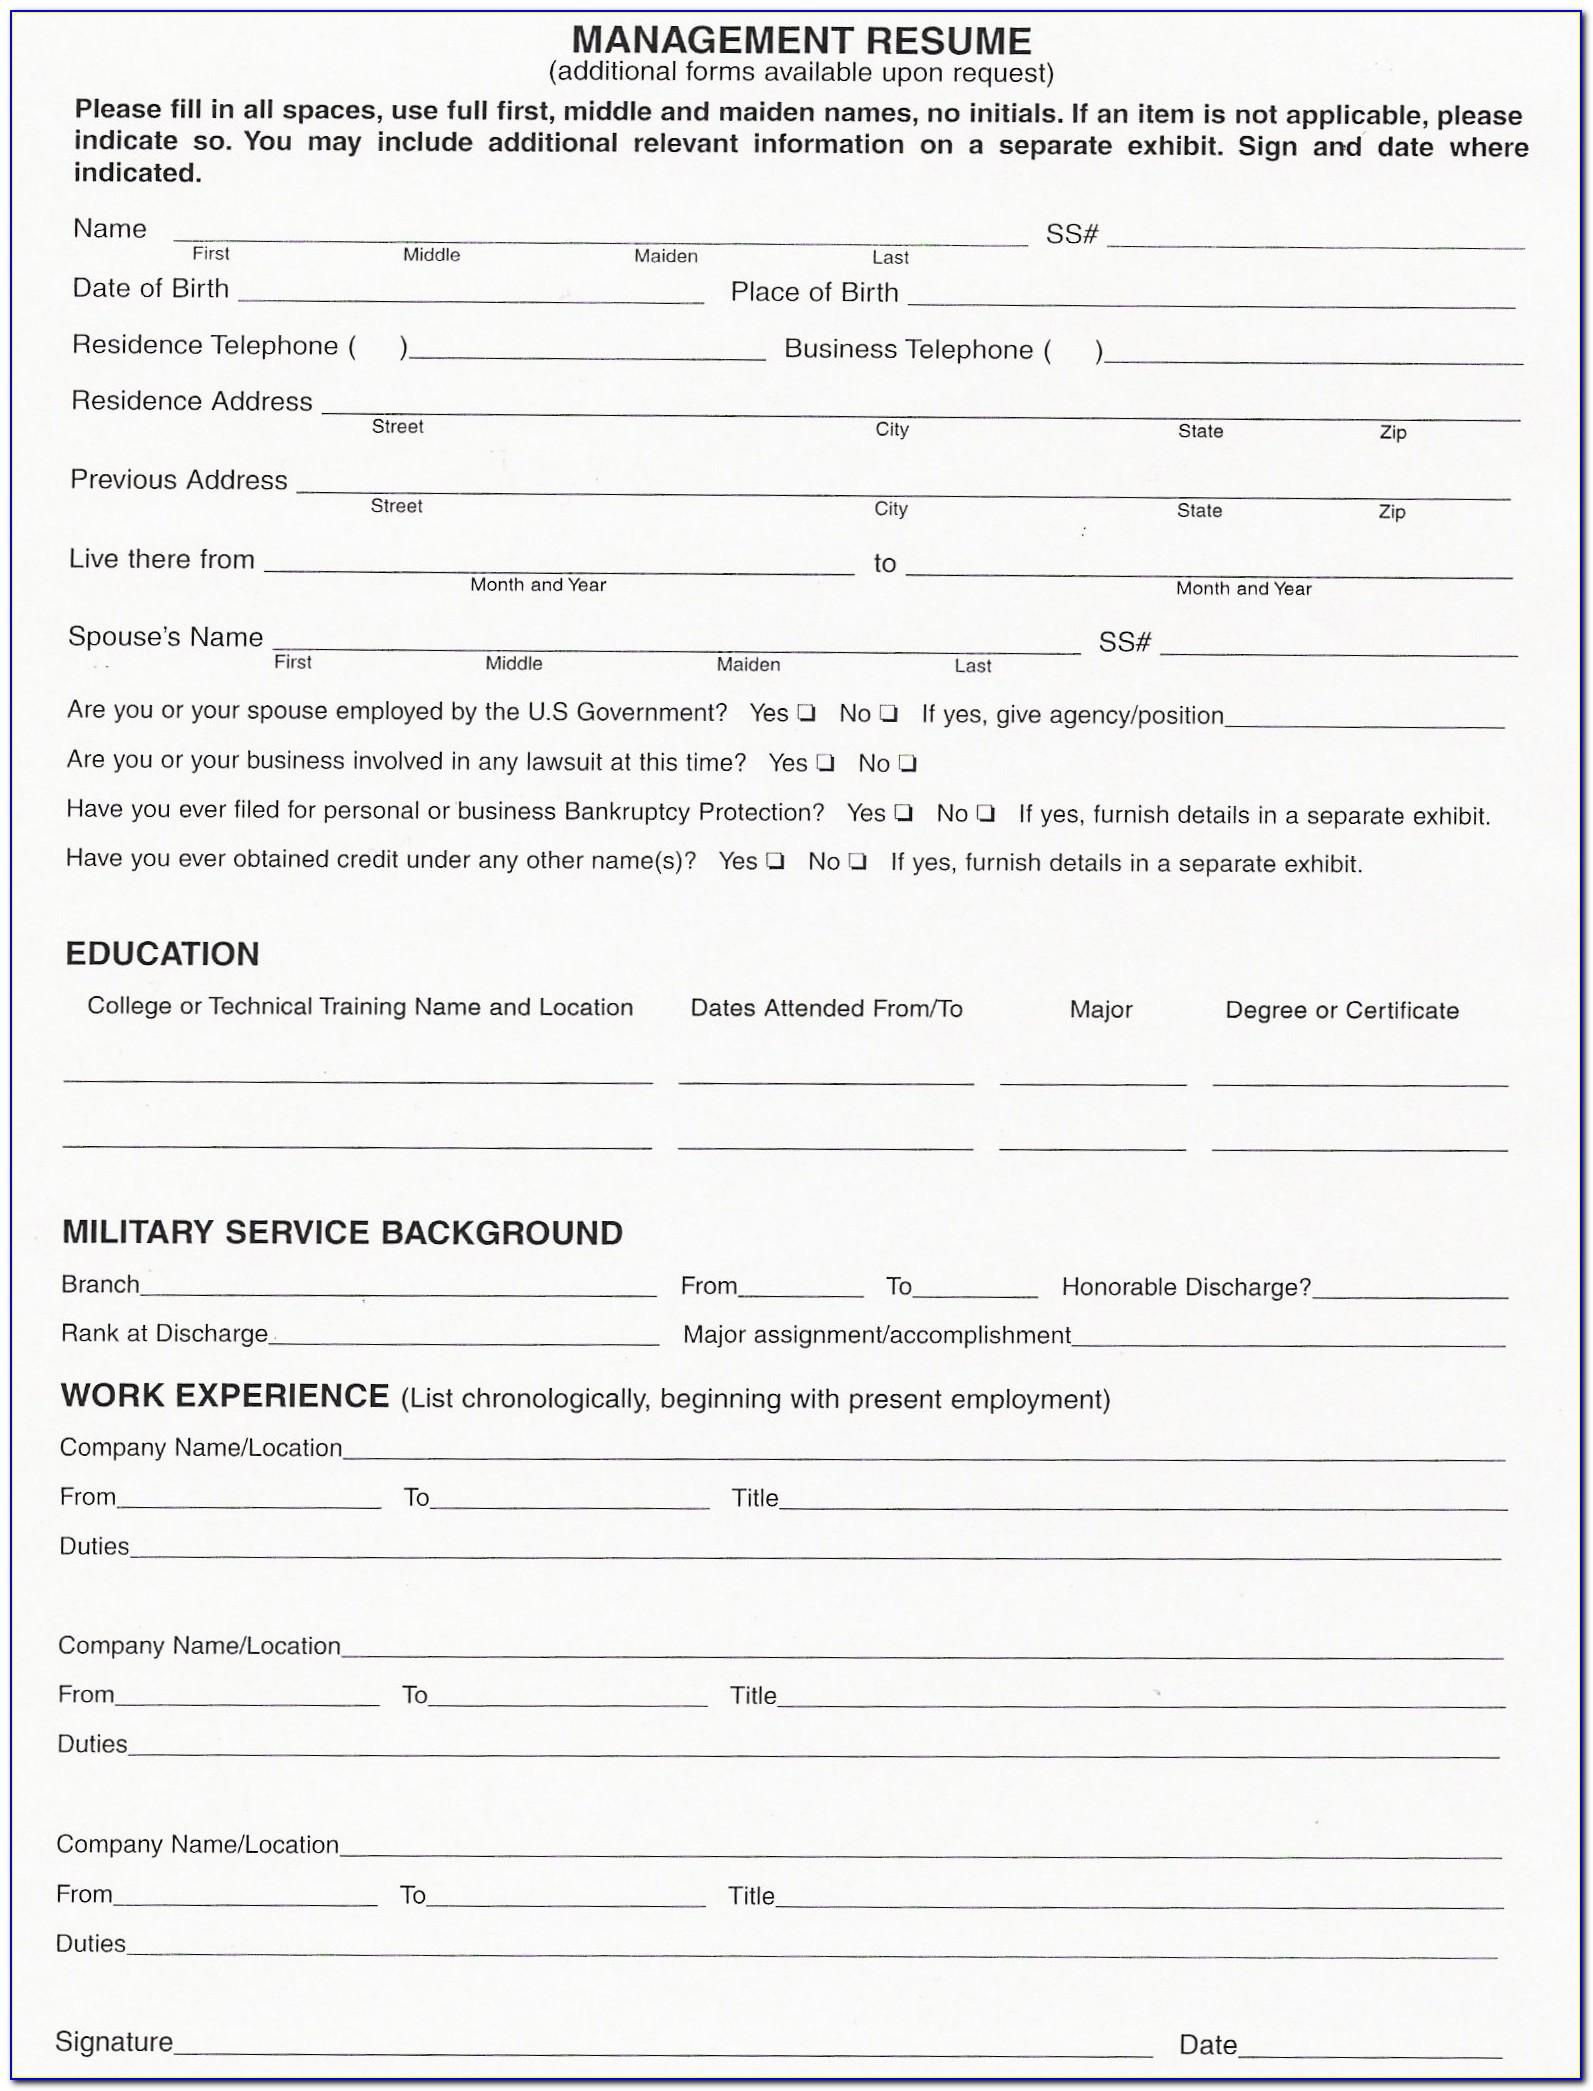 Blank Cv Form For Job Application